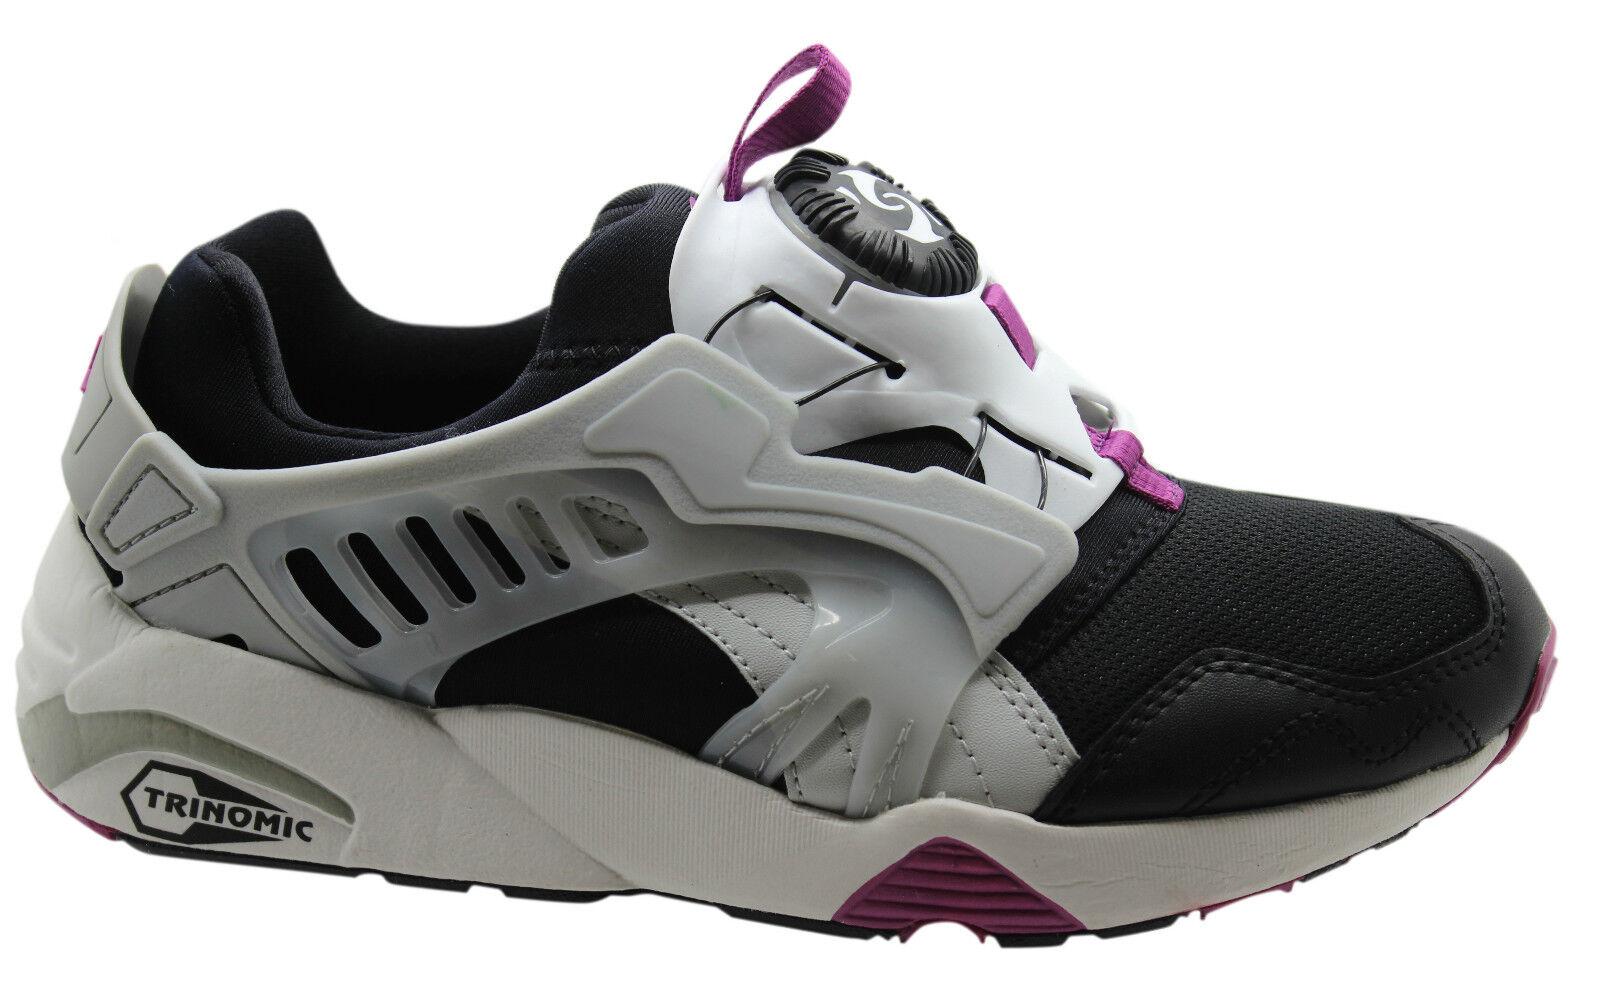 Puma Trinomic Disc Blaze Basic Sports Wo Hommes Trainers Slip On Chaussures 357526 03 P2